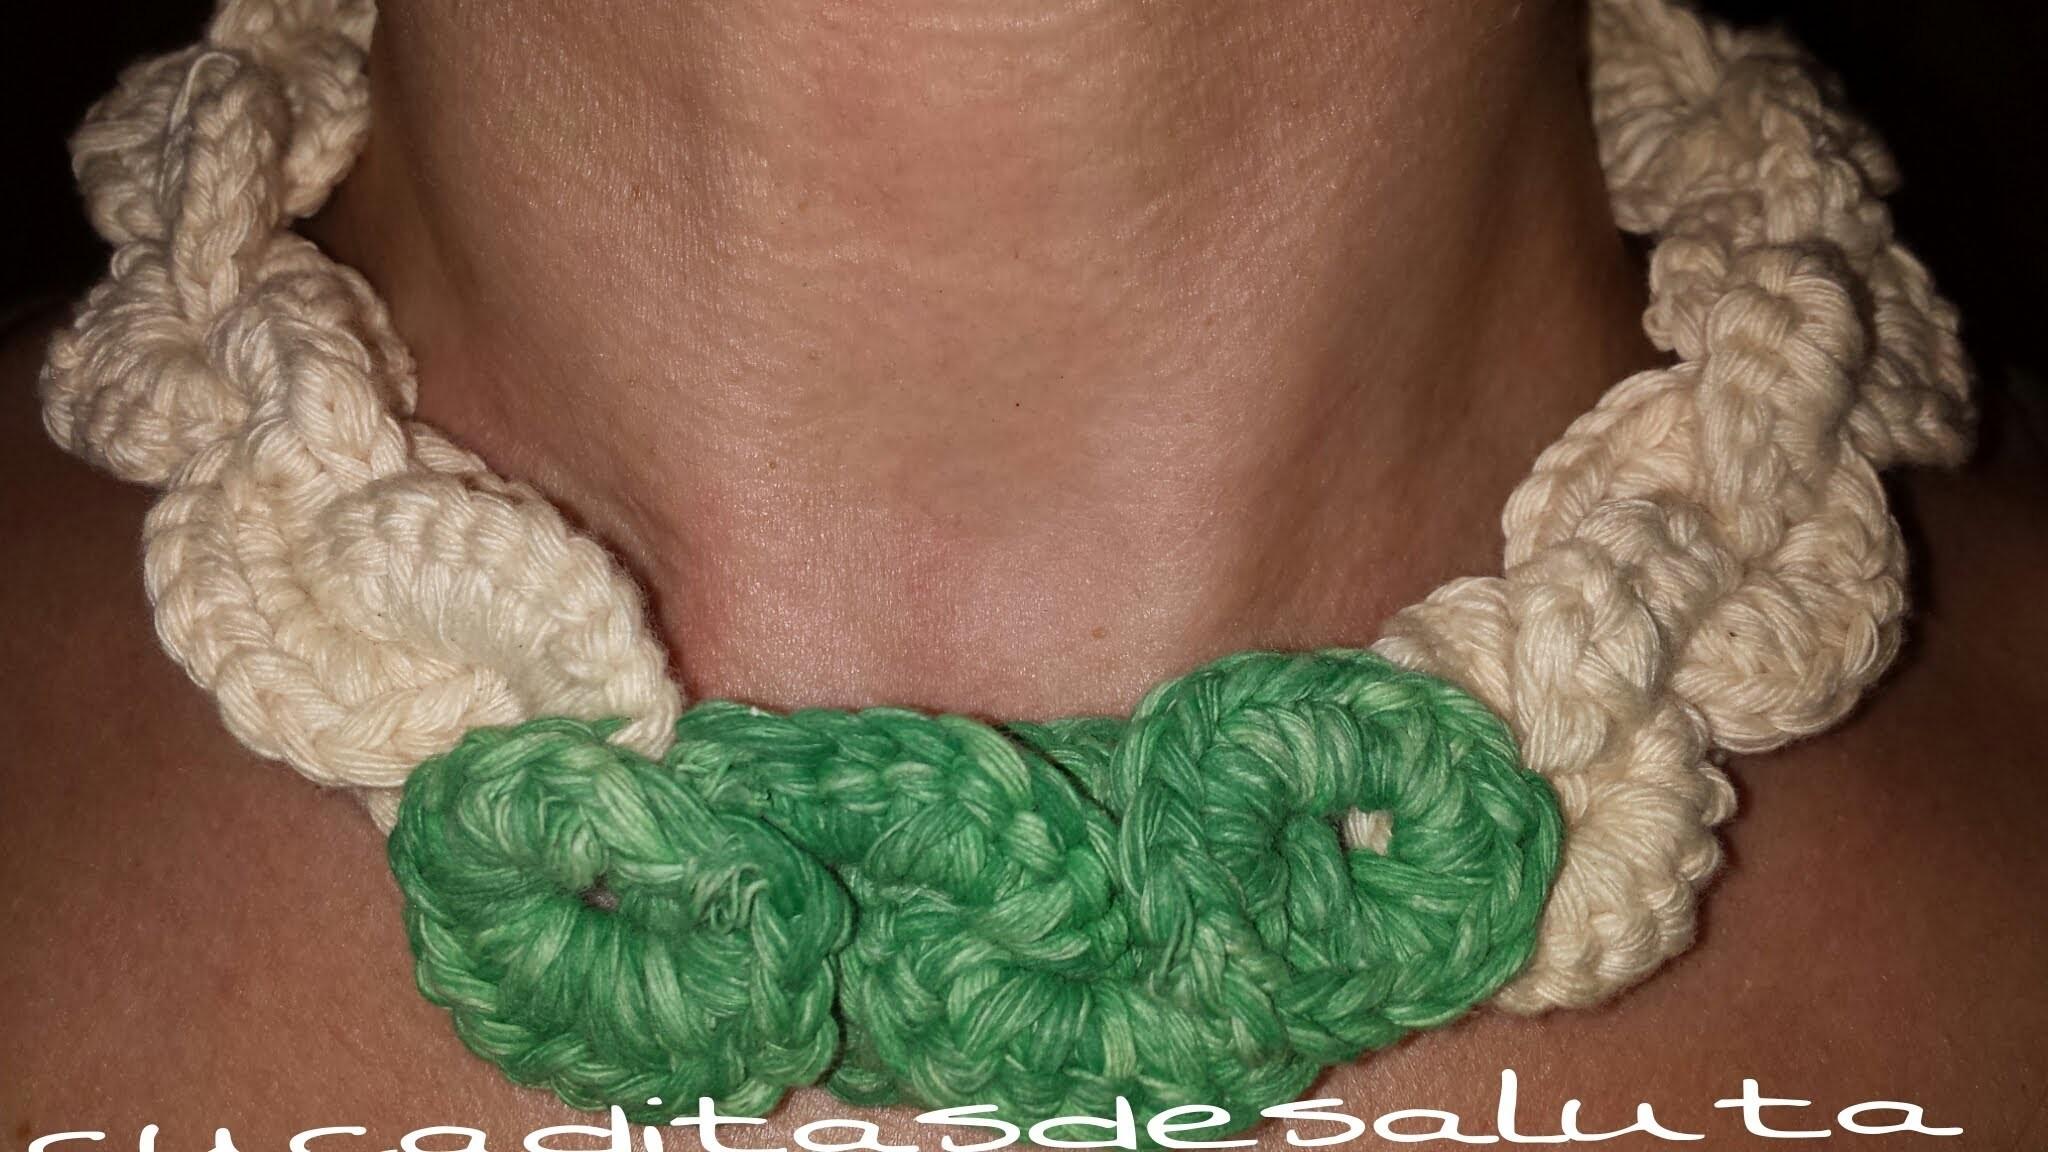 Collar de ganchillo tejido. DIY Crochet chain necklace.